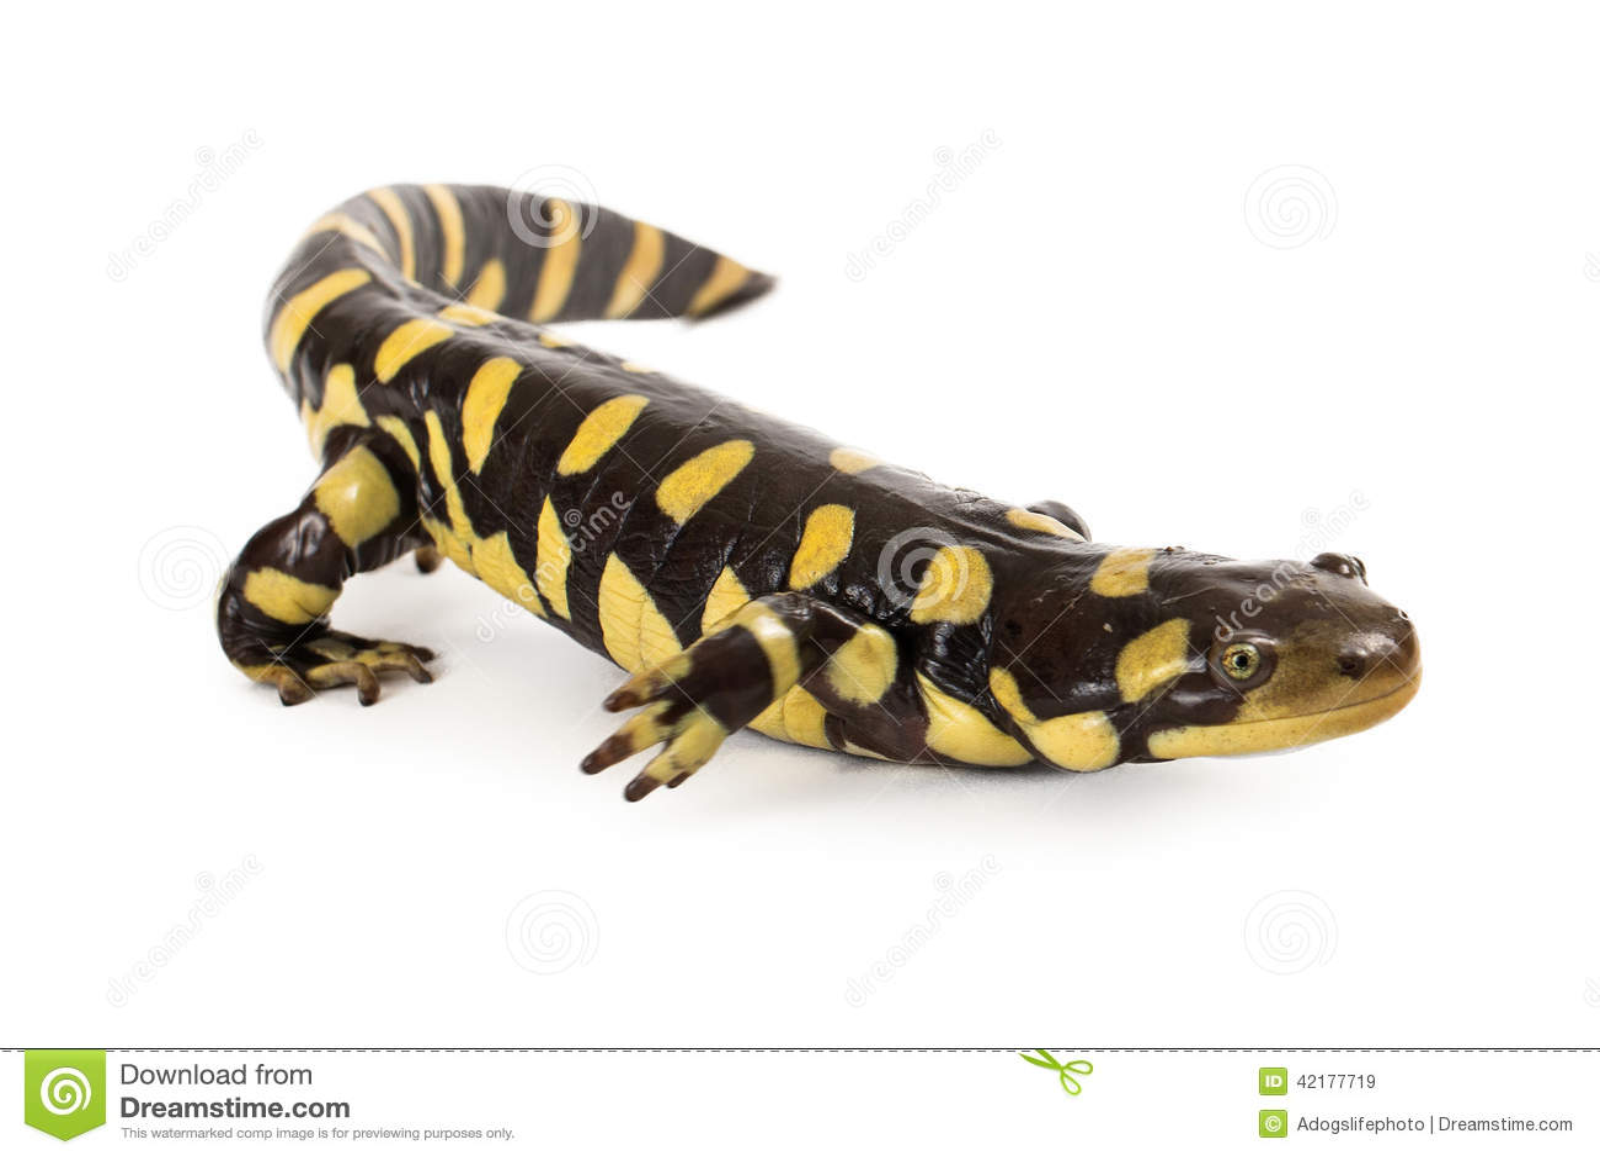 salamander white background - photo #35